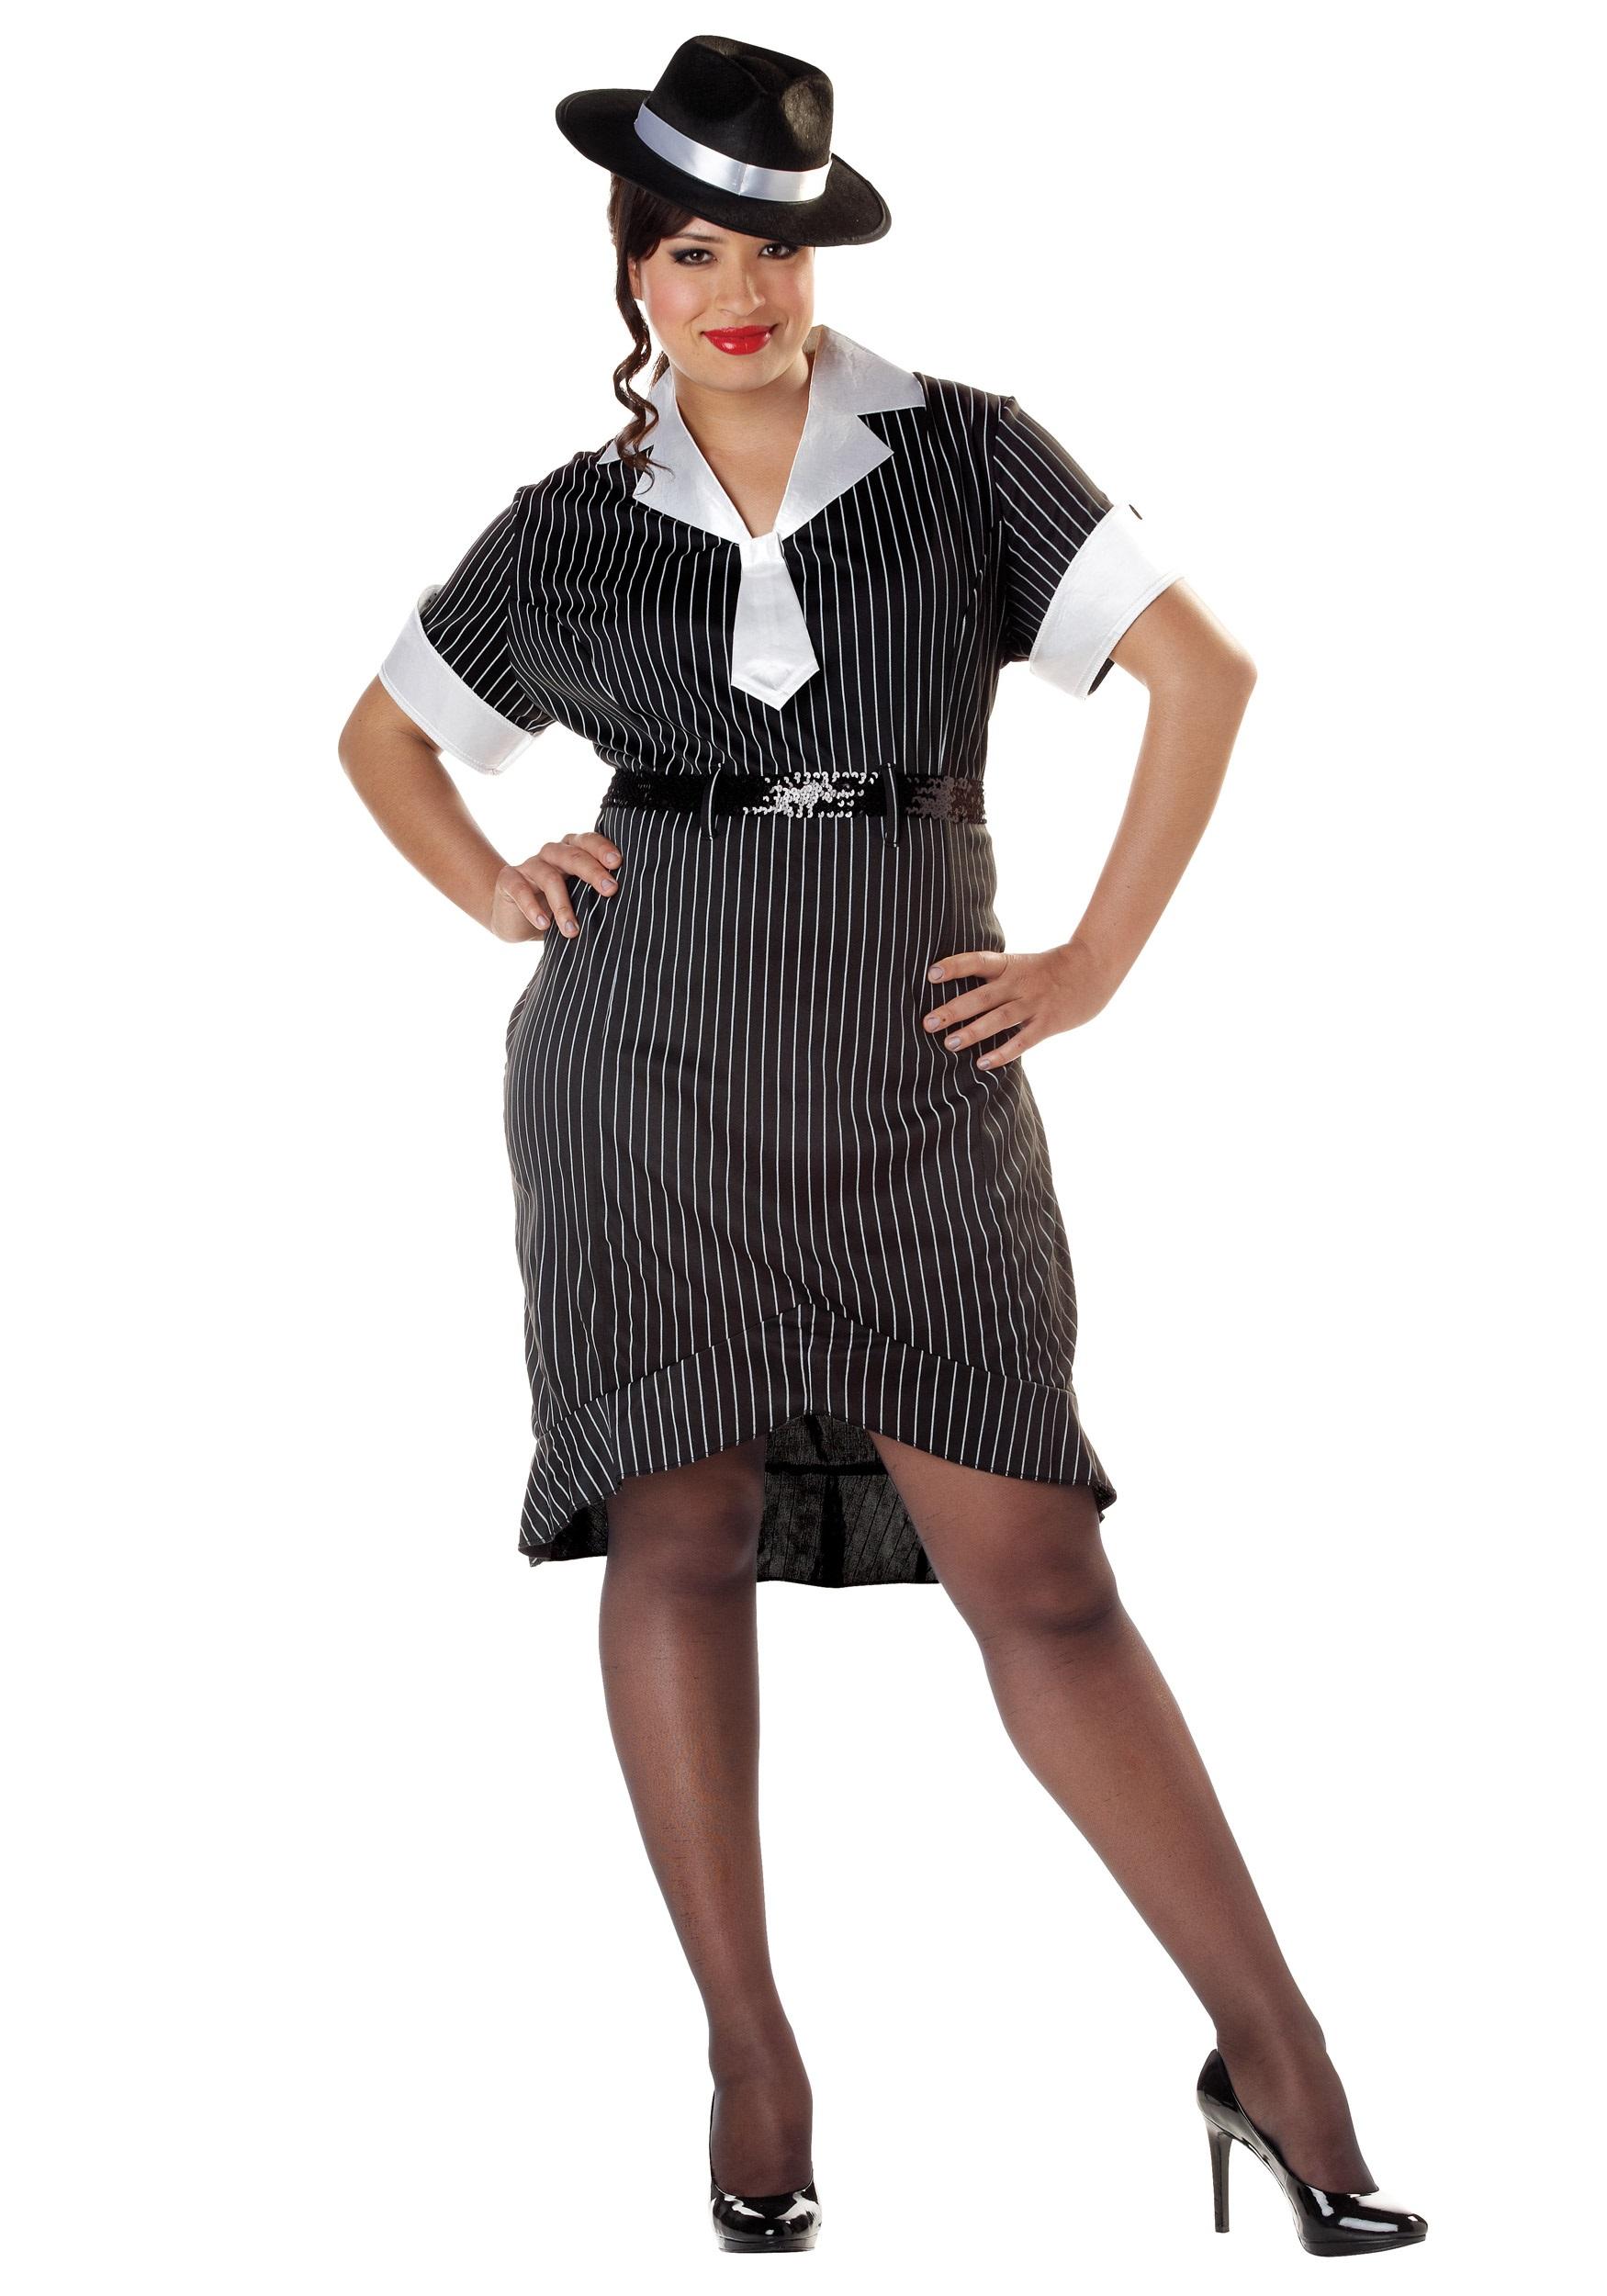 Womenu0027s Plus Size Flirty Gangster Costume  sc 1 st  Halloween Costumes & Womenu0027s Plus Size Flirty Gangster Costume - Halloween Costumes